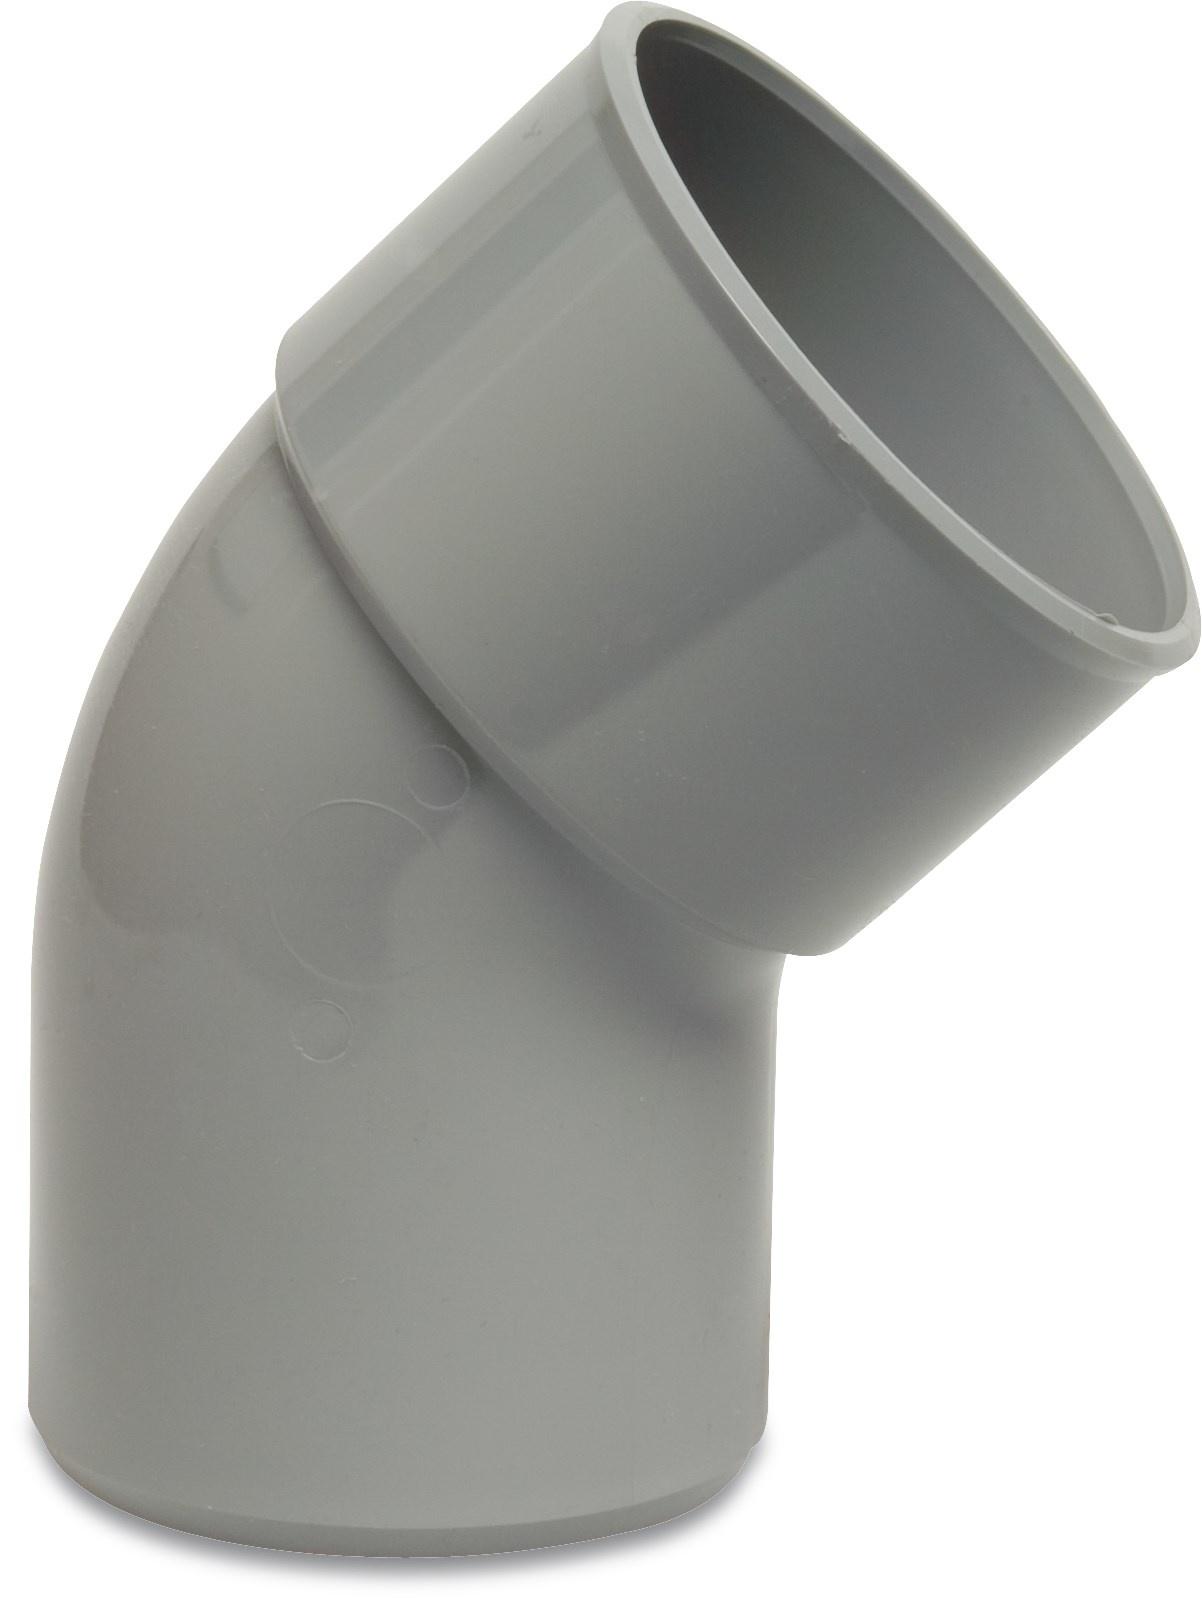 PVC Bocht 45° - Ø40 t/m Ø125 mm - 1x inwendig lijm